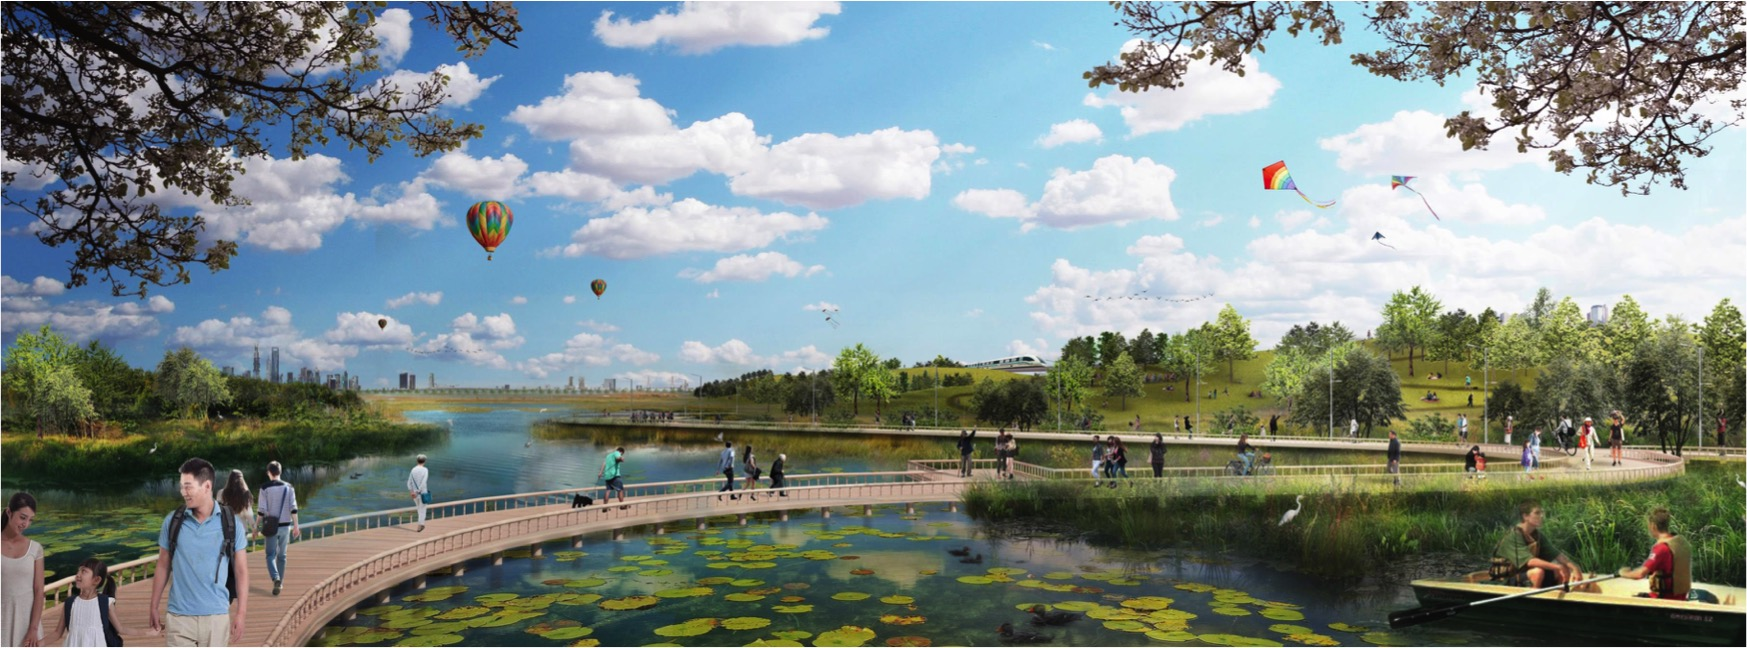 Urban Wetland Park.jpg